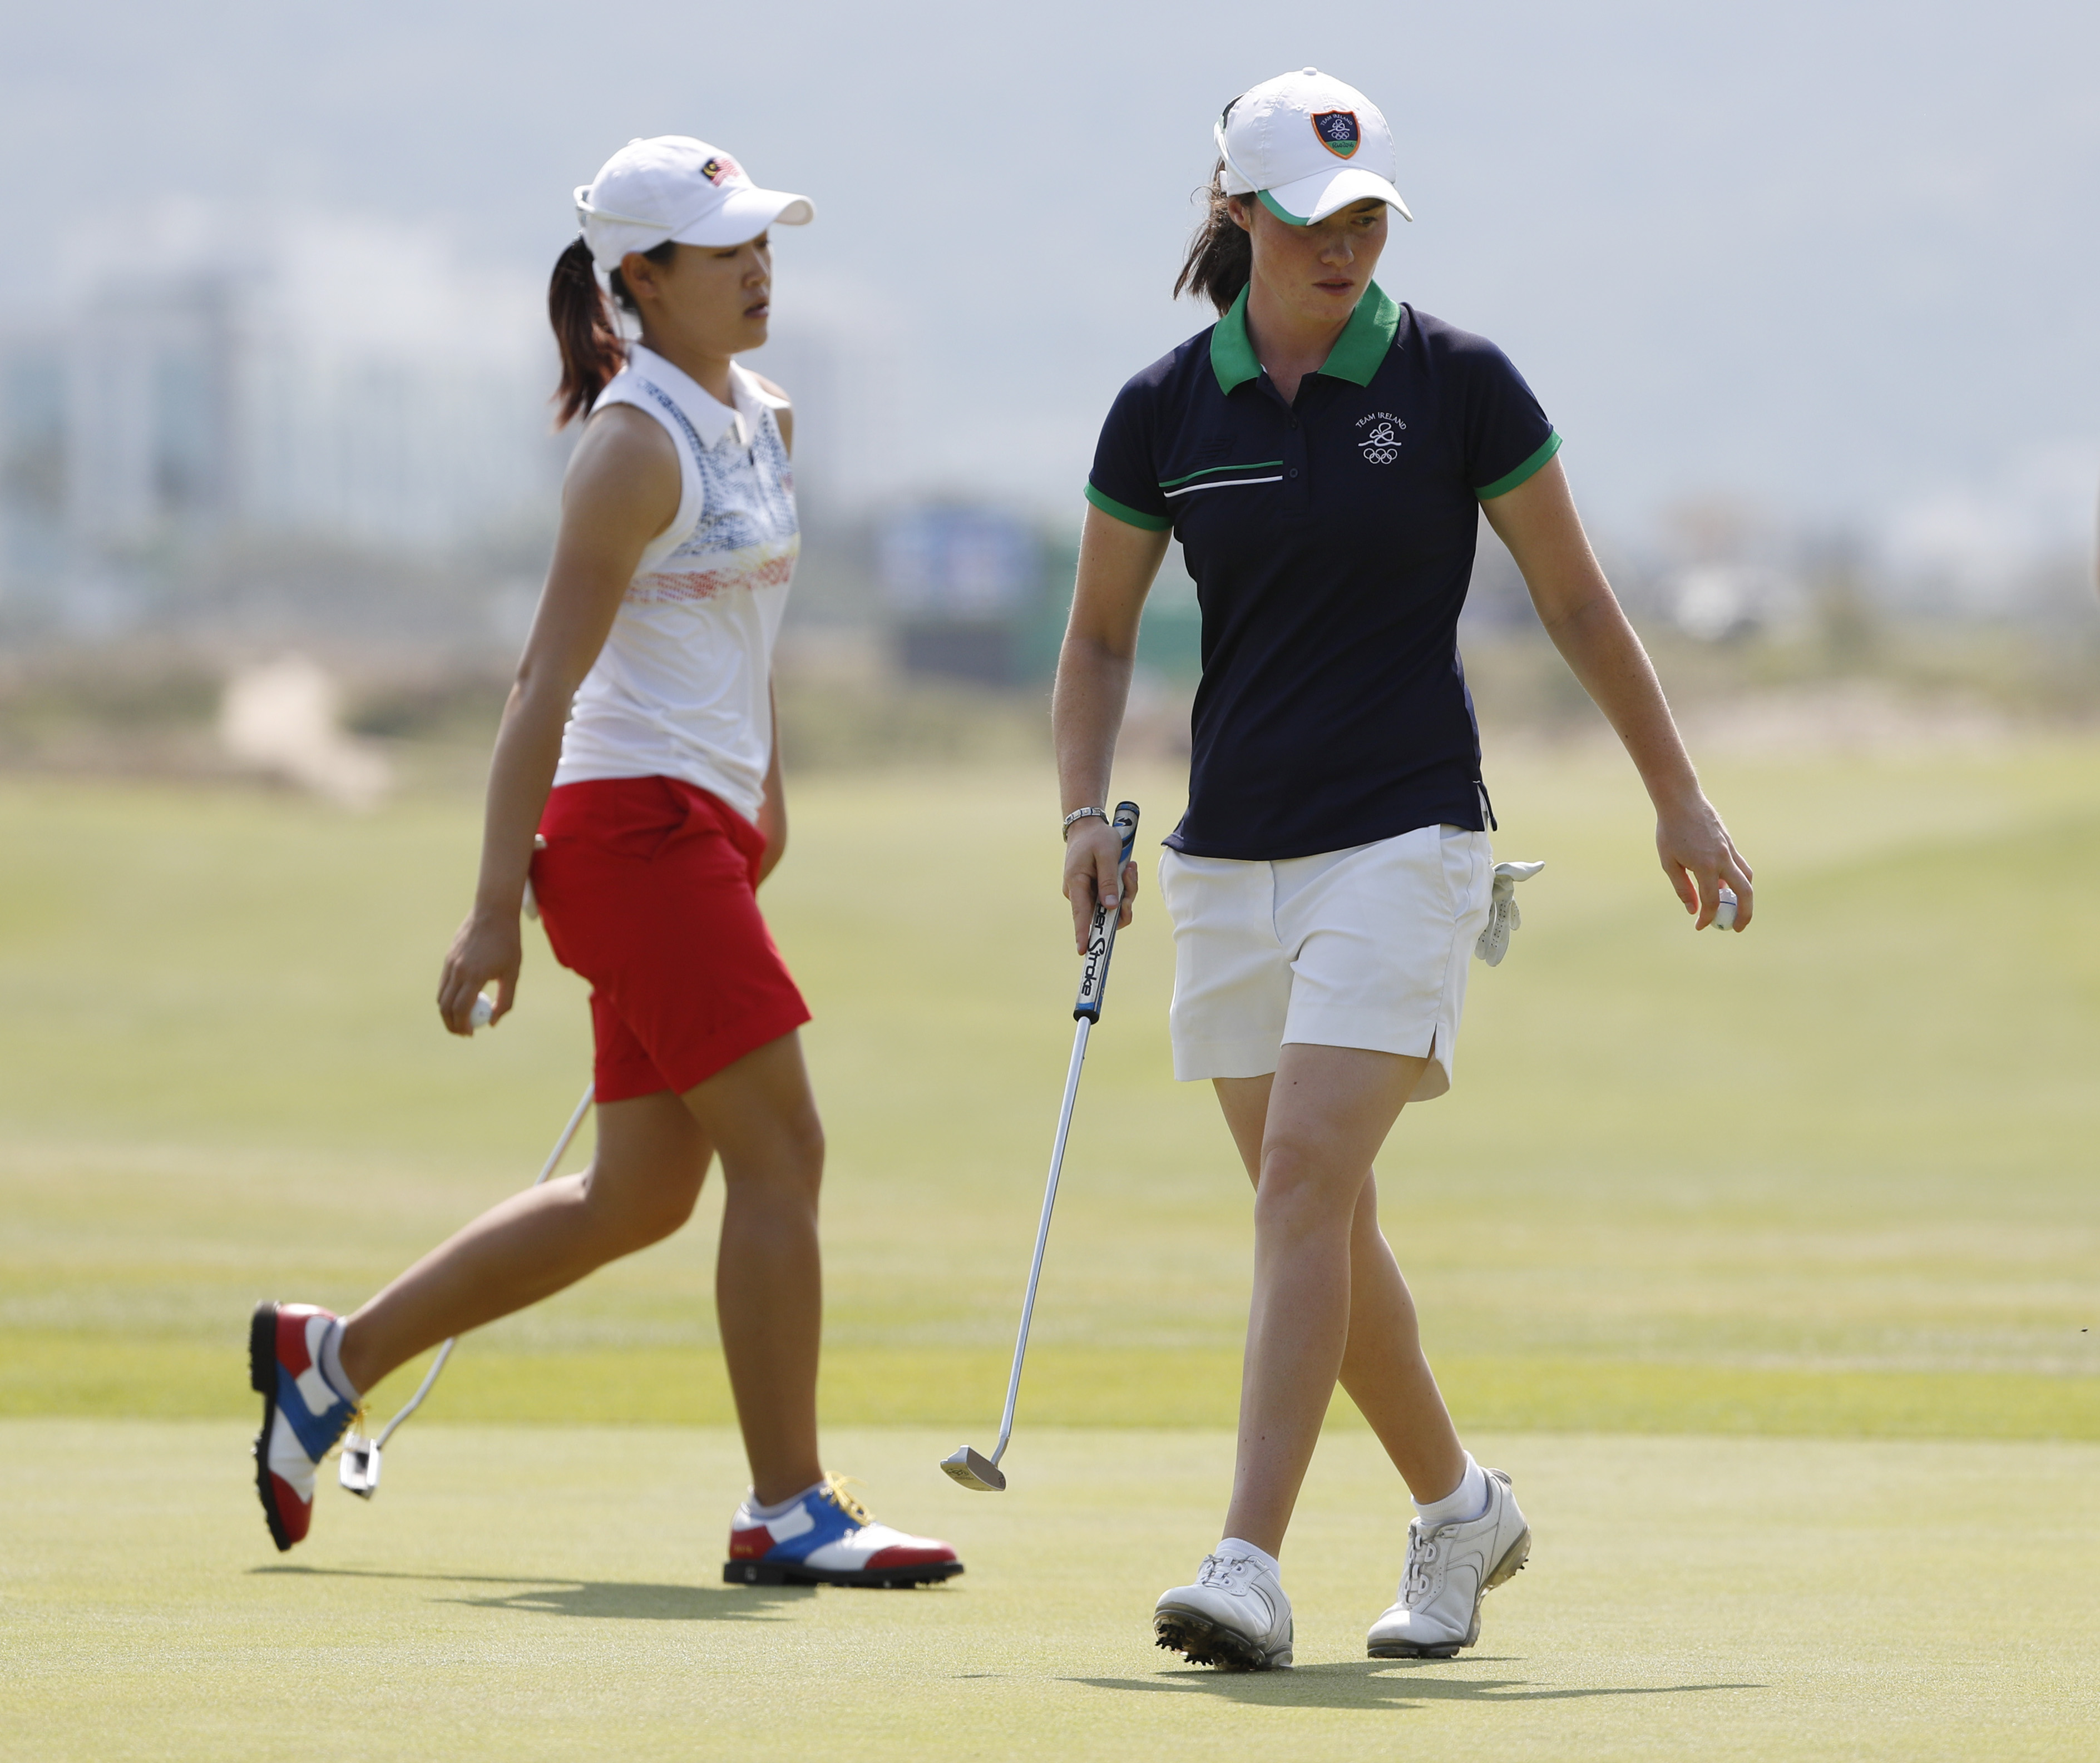 9481306-olympics-golf-womens-individual-round-2-1